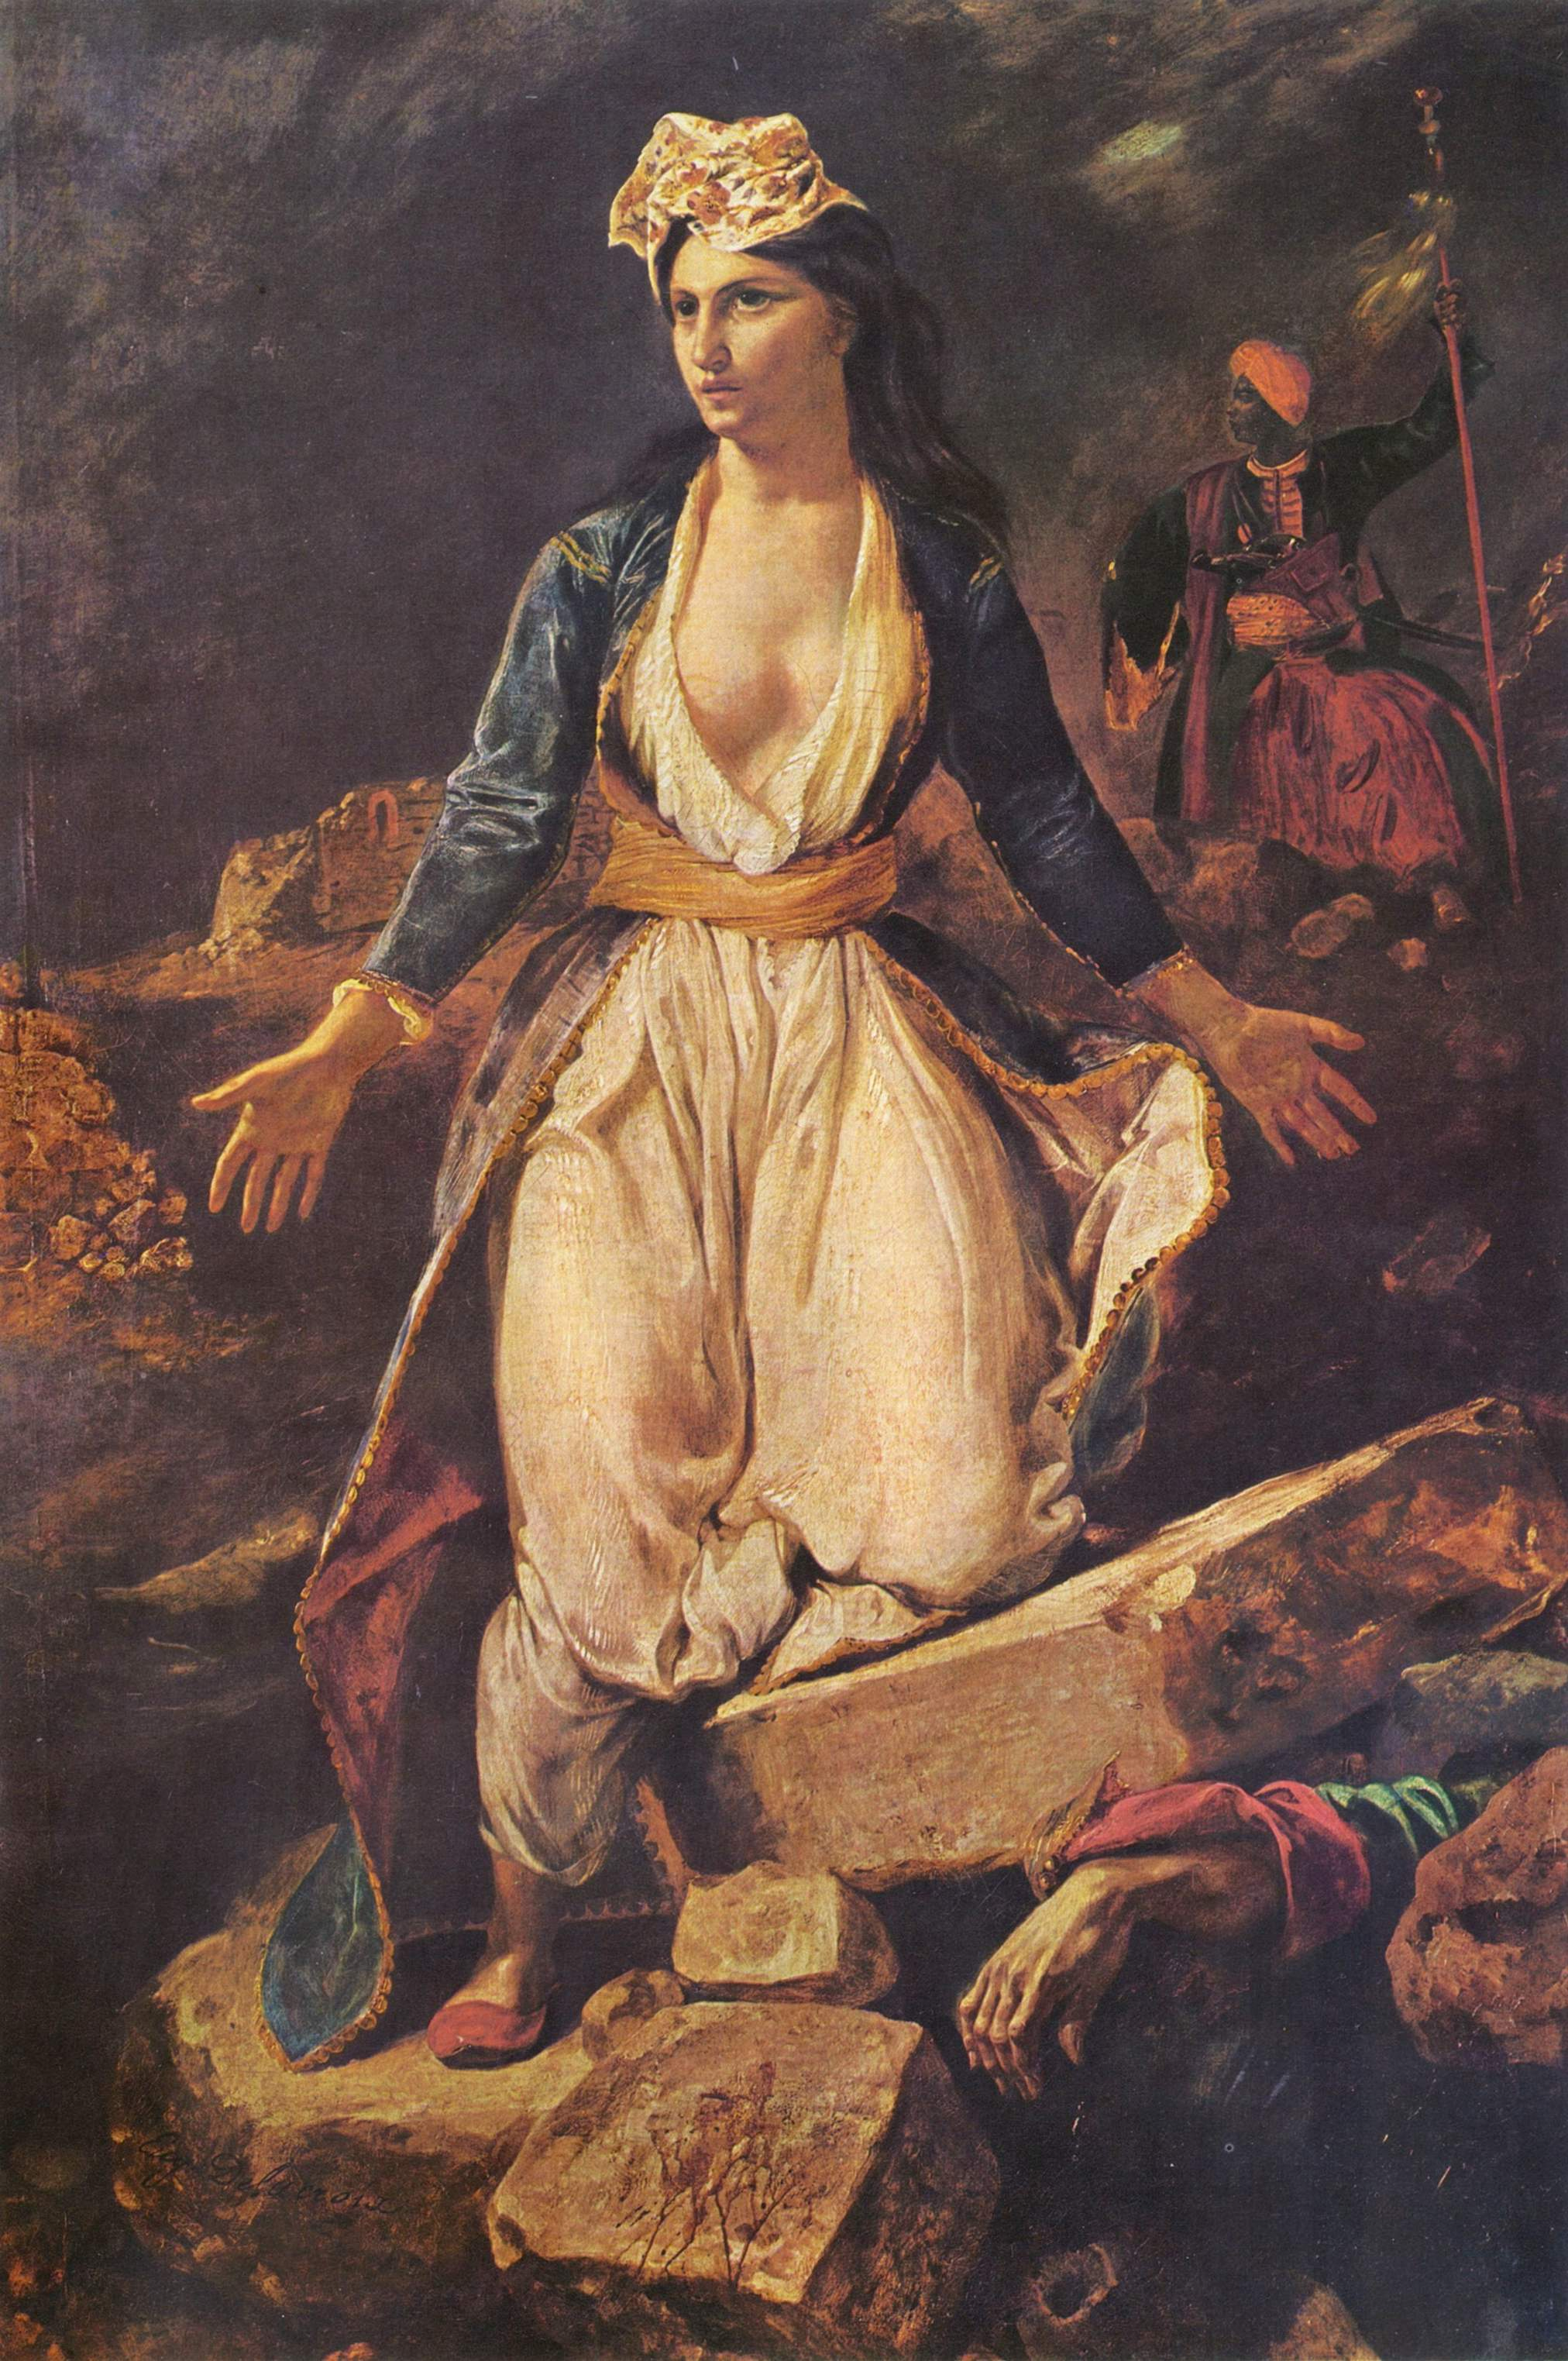 Греция на развалинах Миссолонги, Делакруа Эжен Фердинанд Виктор